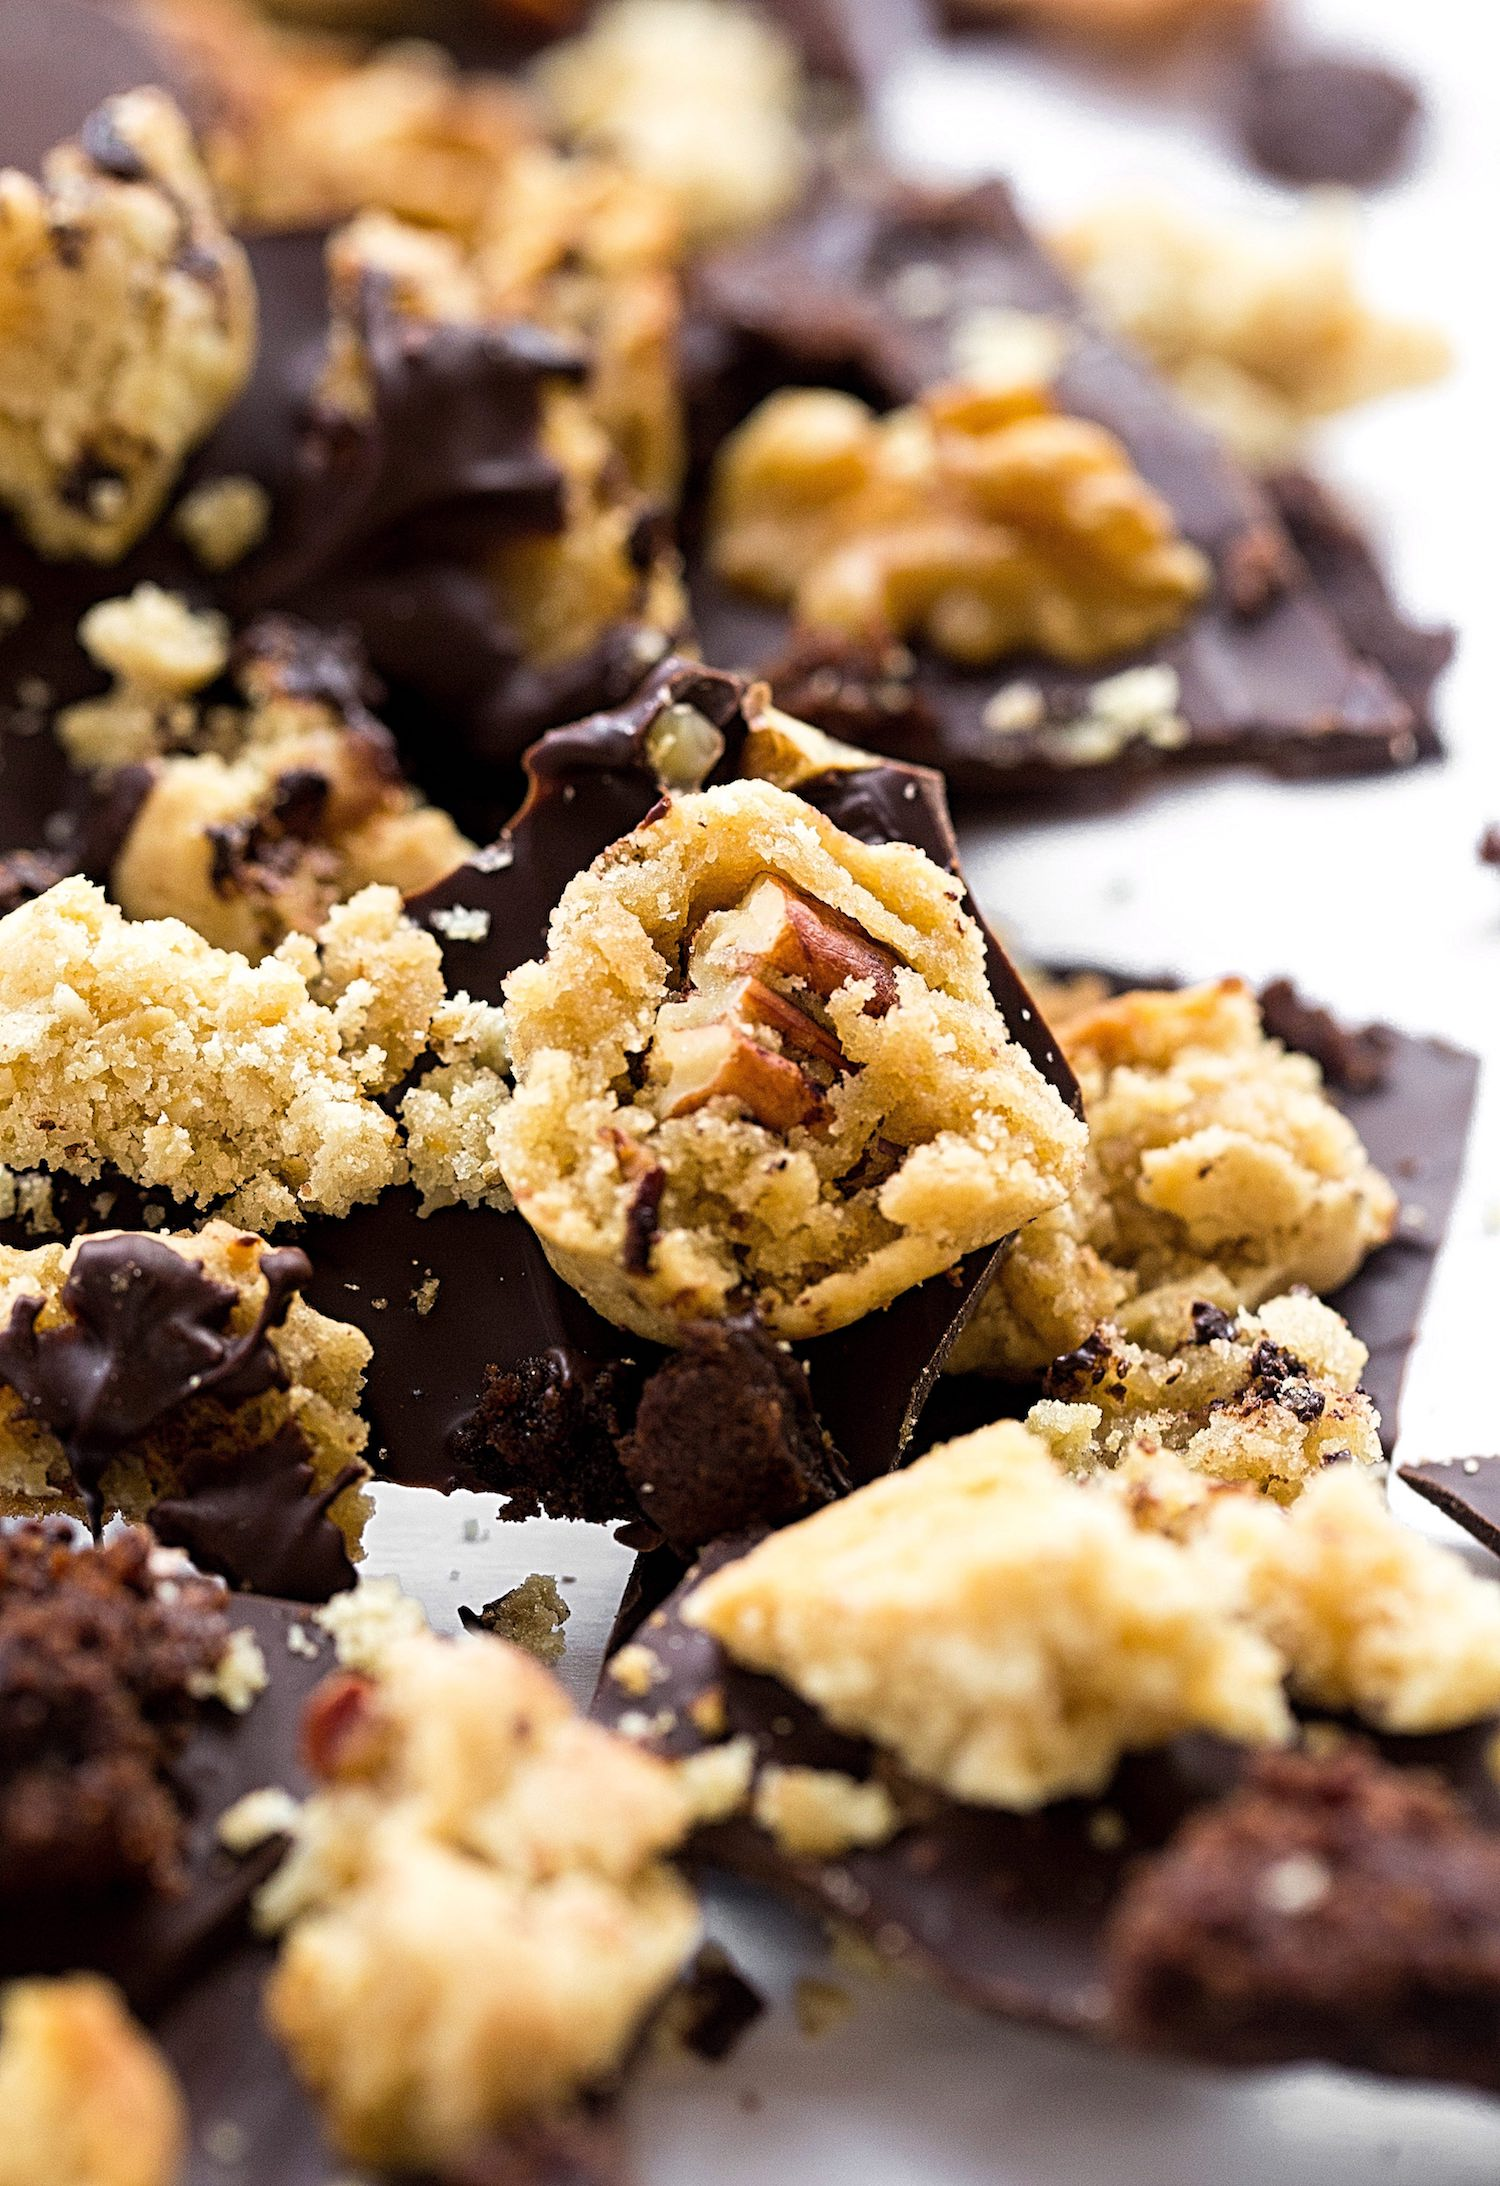 Cookie Cluster Chocolate Bark: crisp, dark chocolate bark stuffed with cookie clusters and nuts. So easy and good!   TrufflesandTrends.com